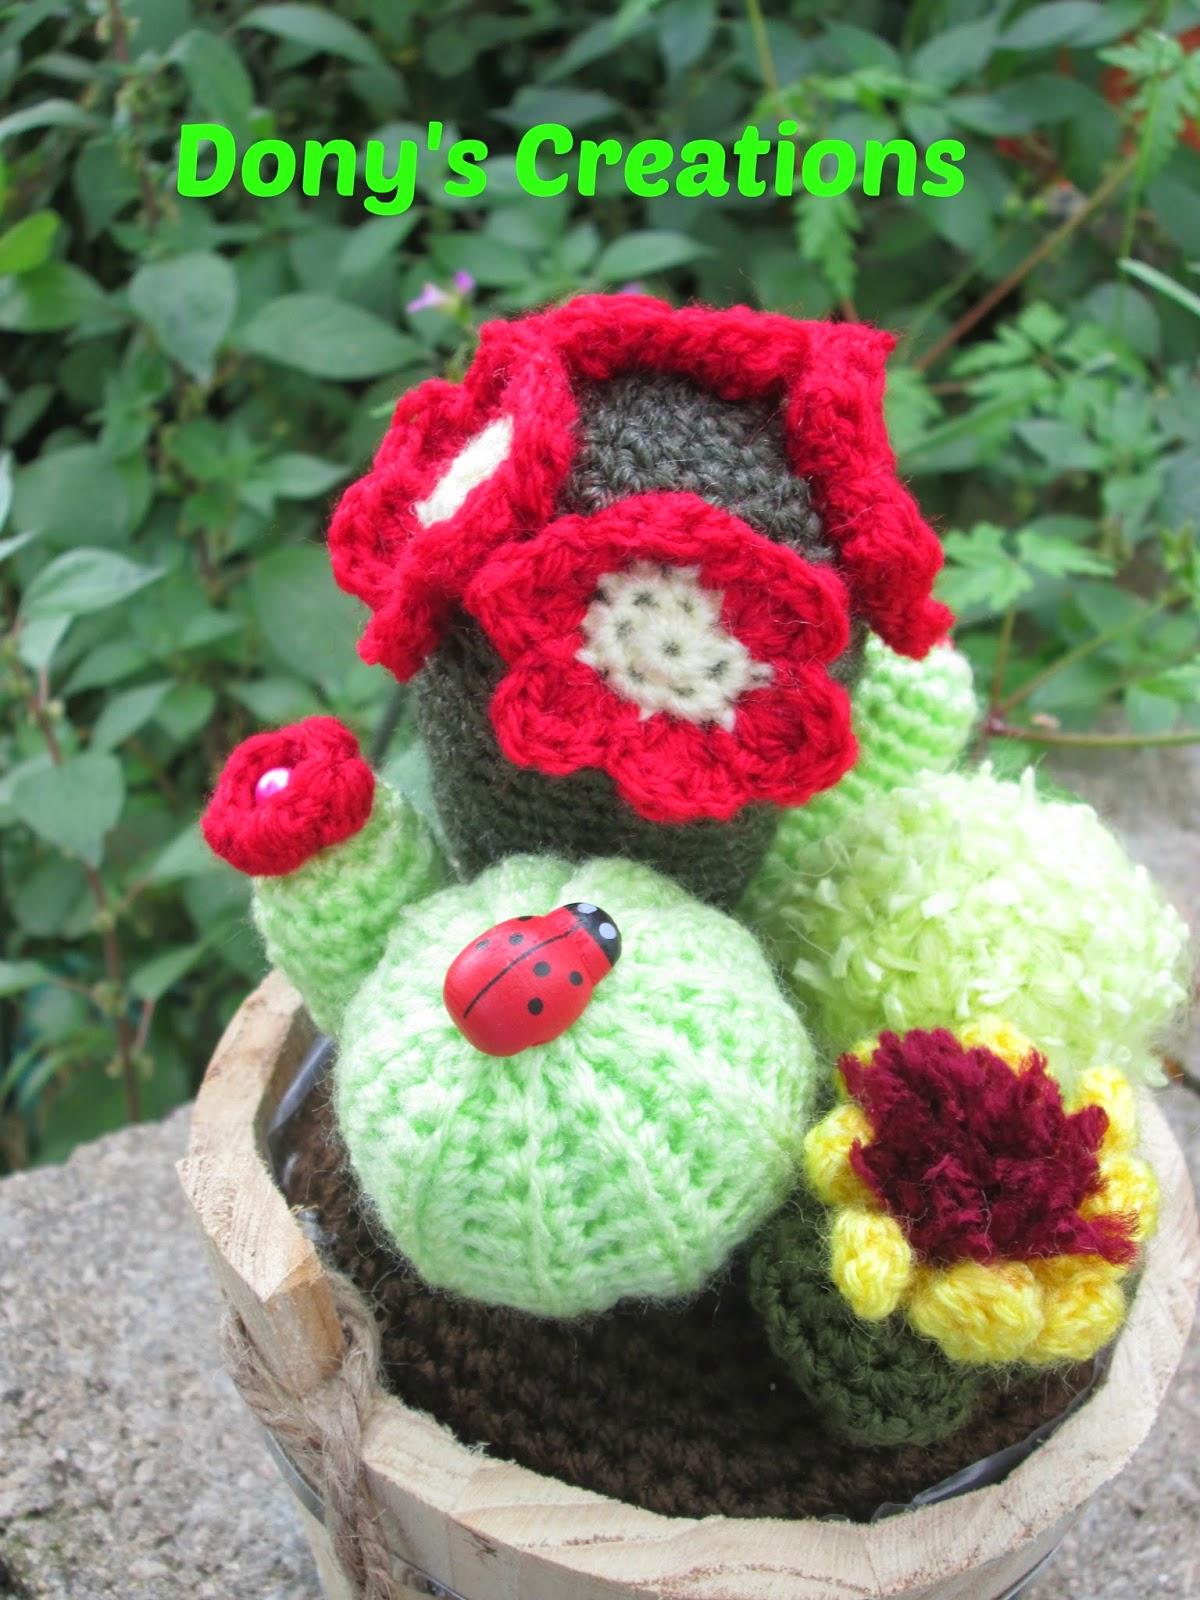 Dony 39 s creations handmade composizione pianta grasse - Composizione piante grasse da interno ...